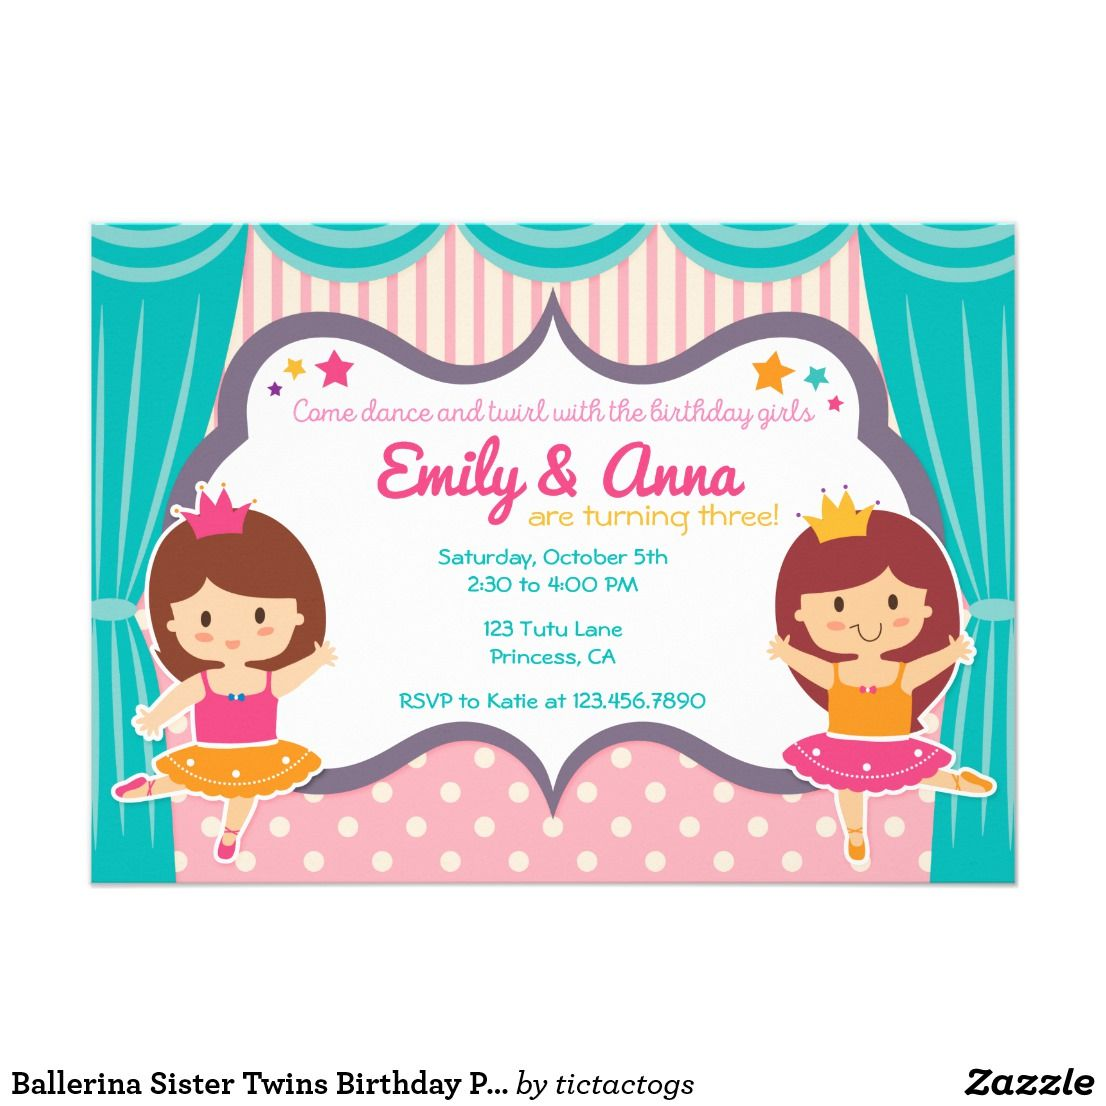 Ballerina Sister Twins Birthday Party Invitation | Pinterest | Twin ...